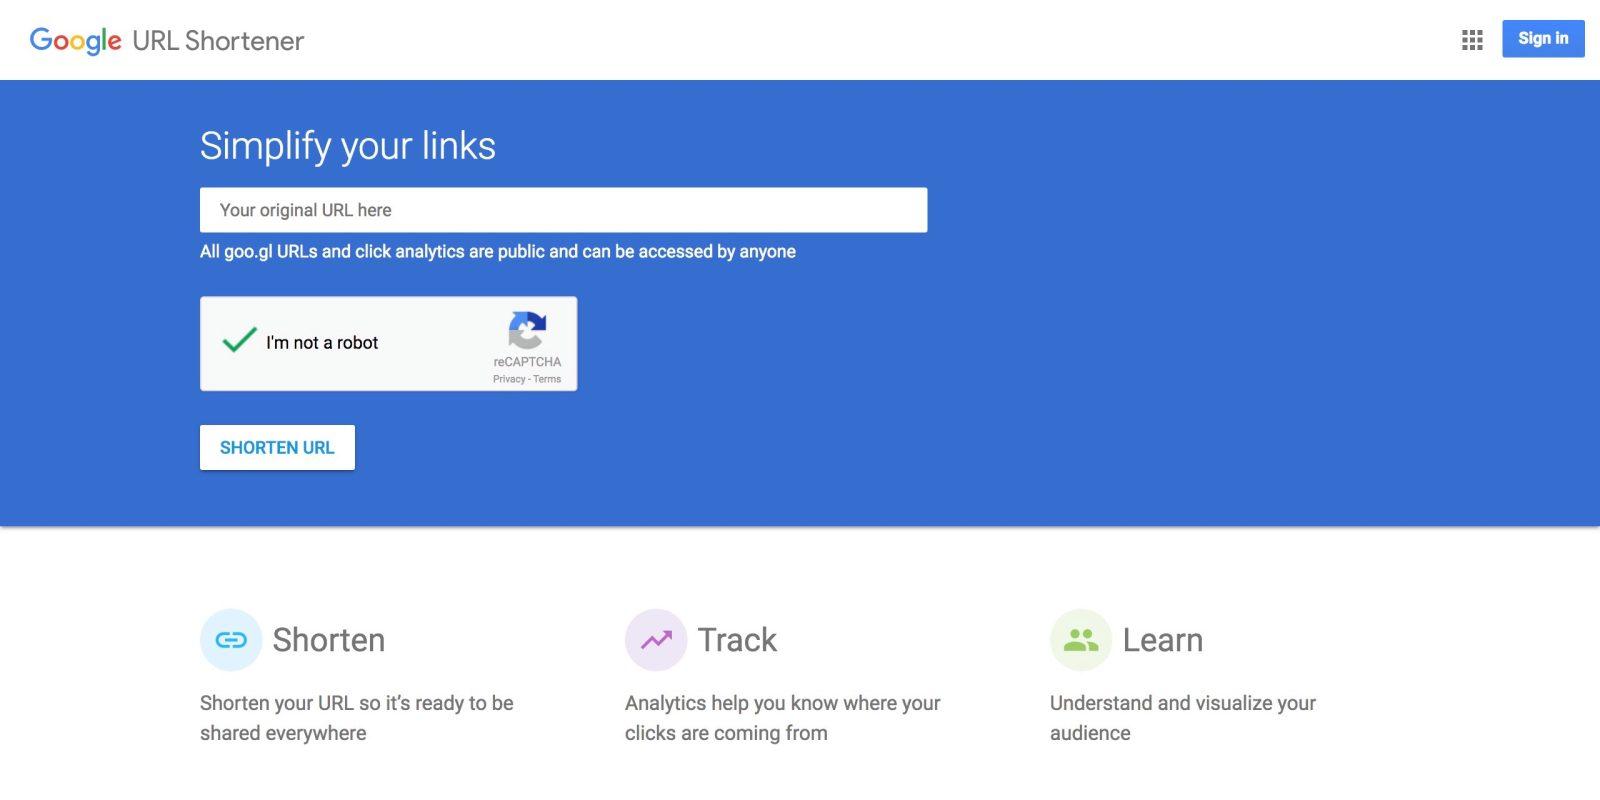 google-url-shortener